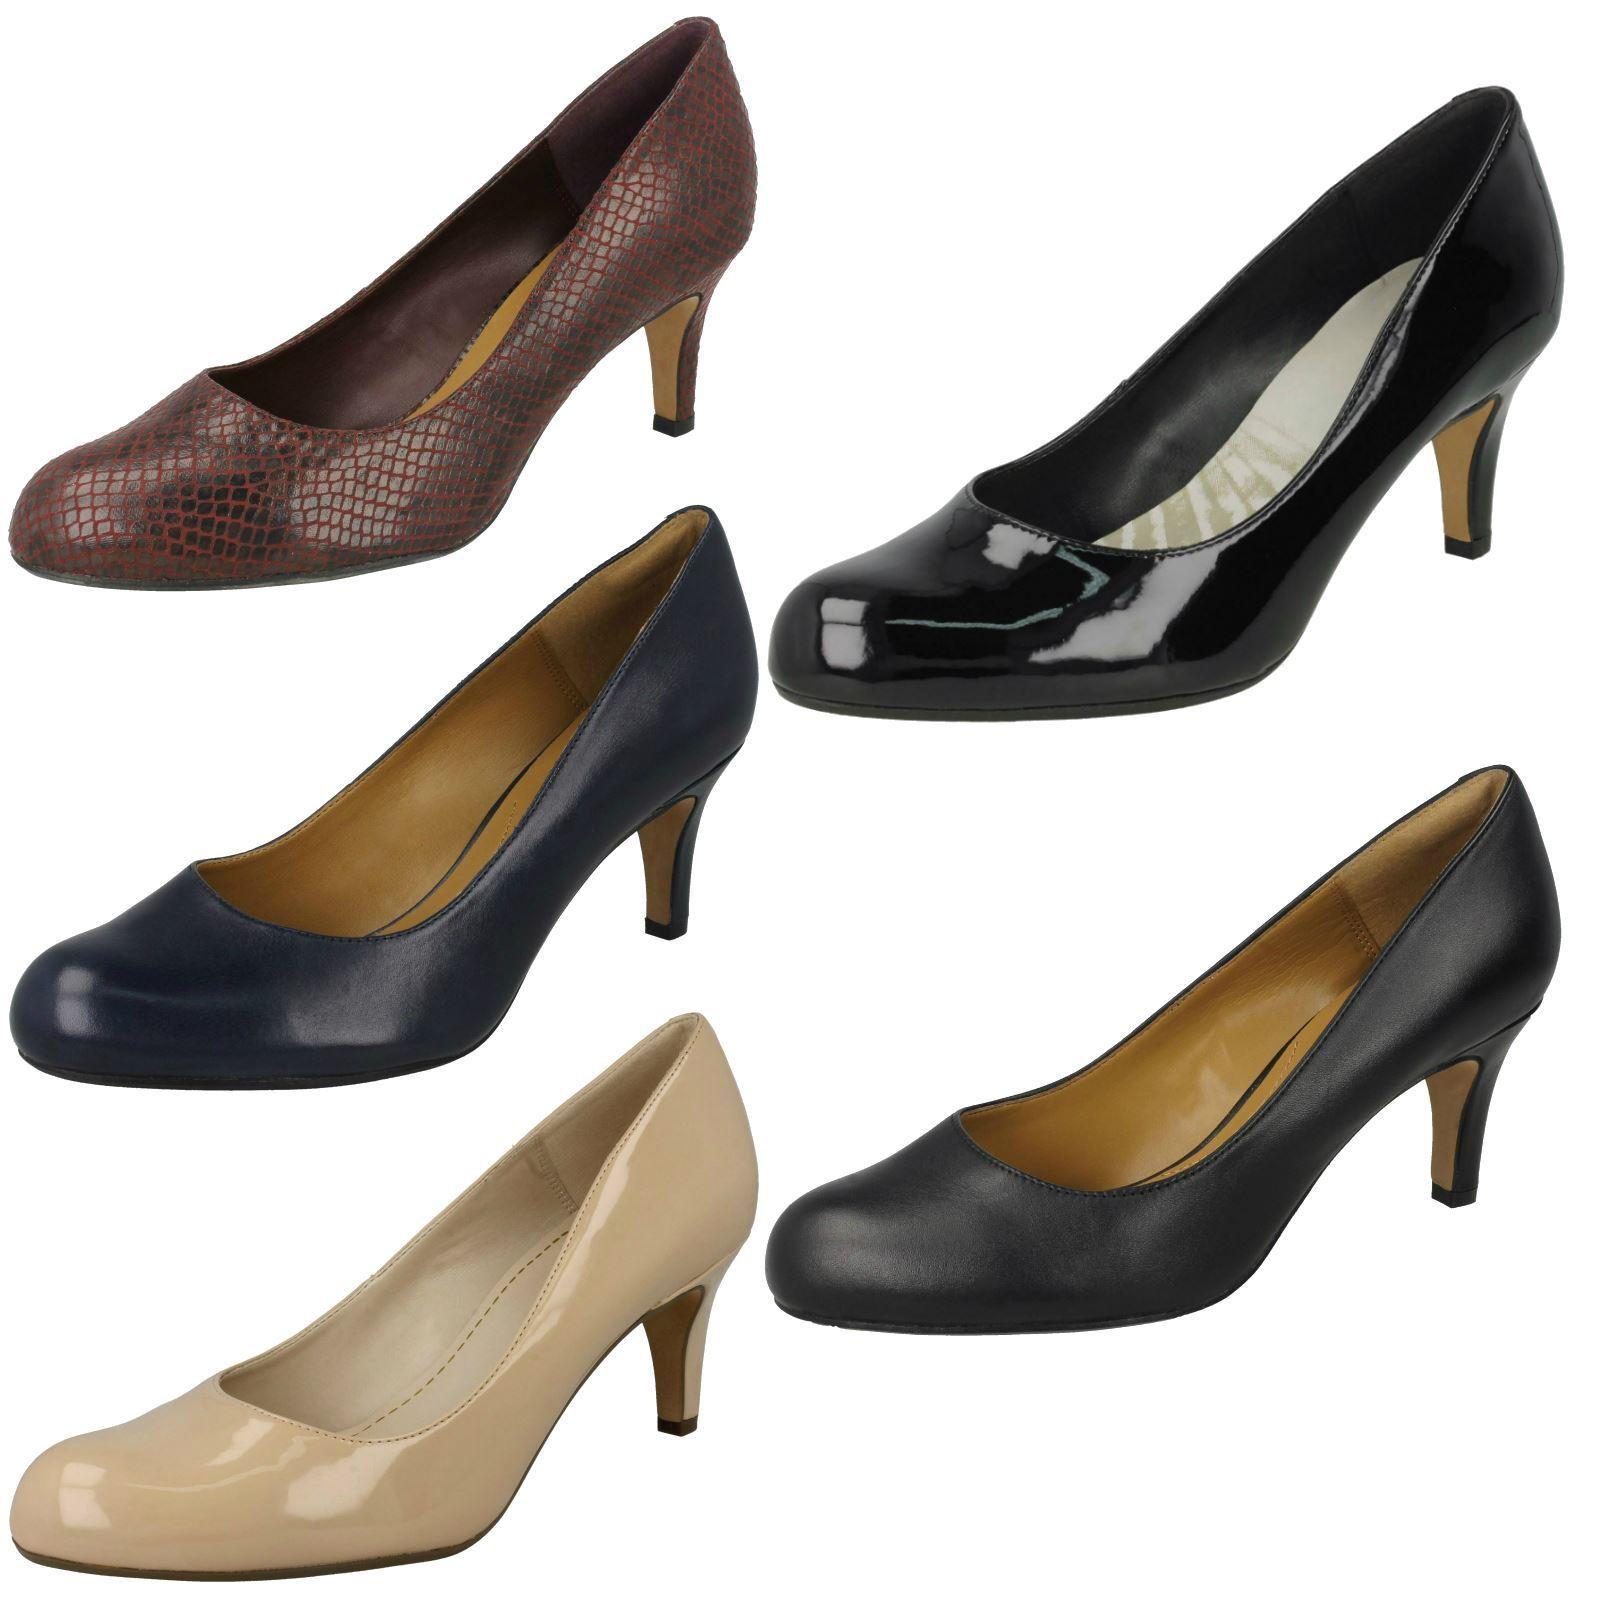 Clarks Ladies Court shoes Arista Abe